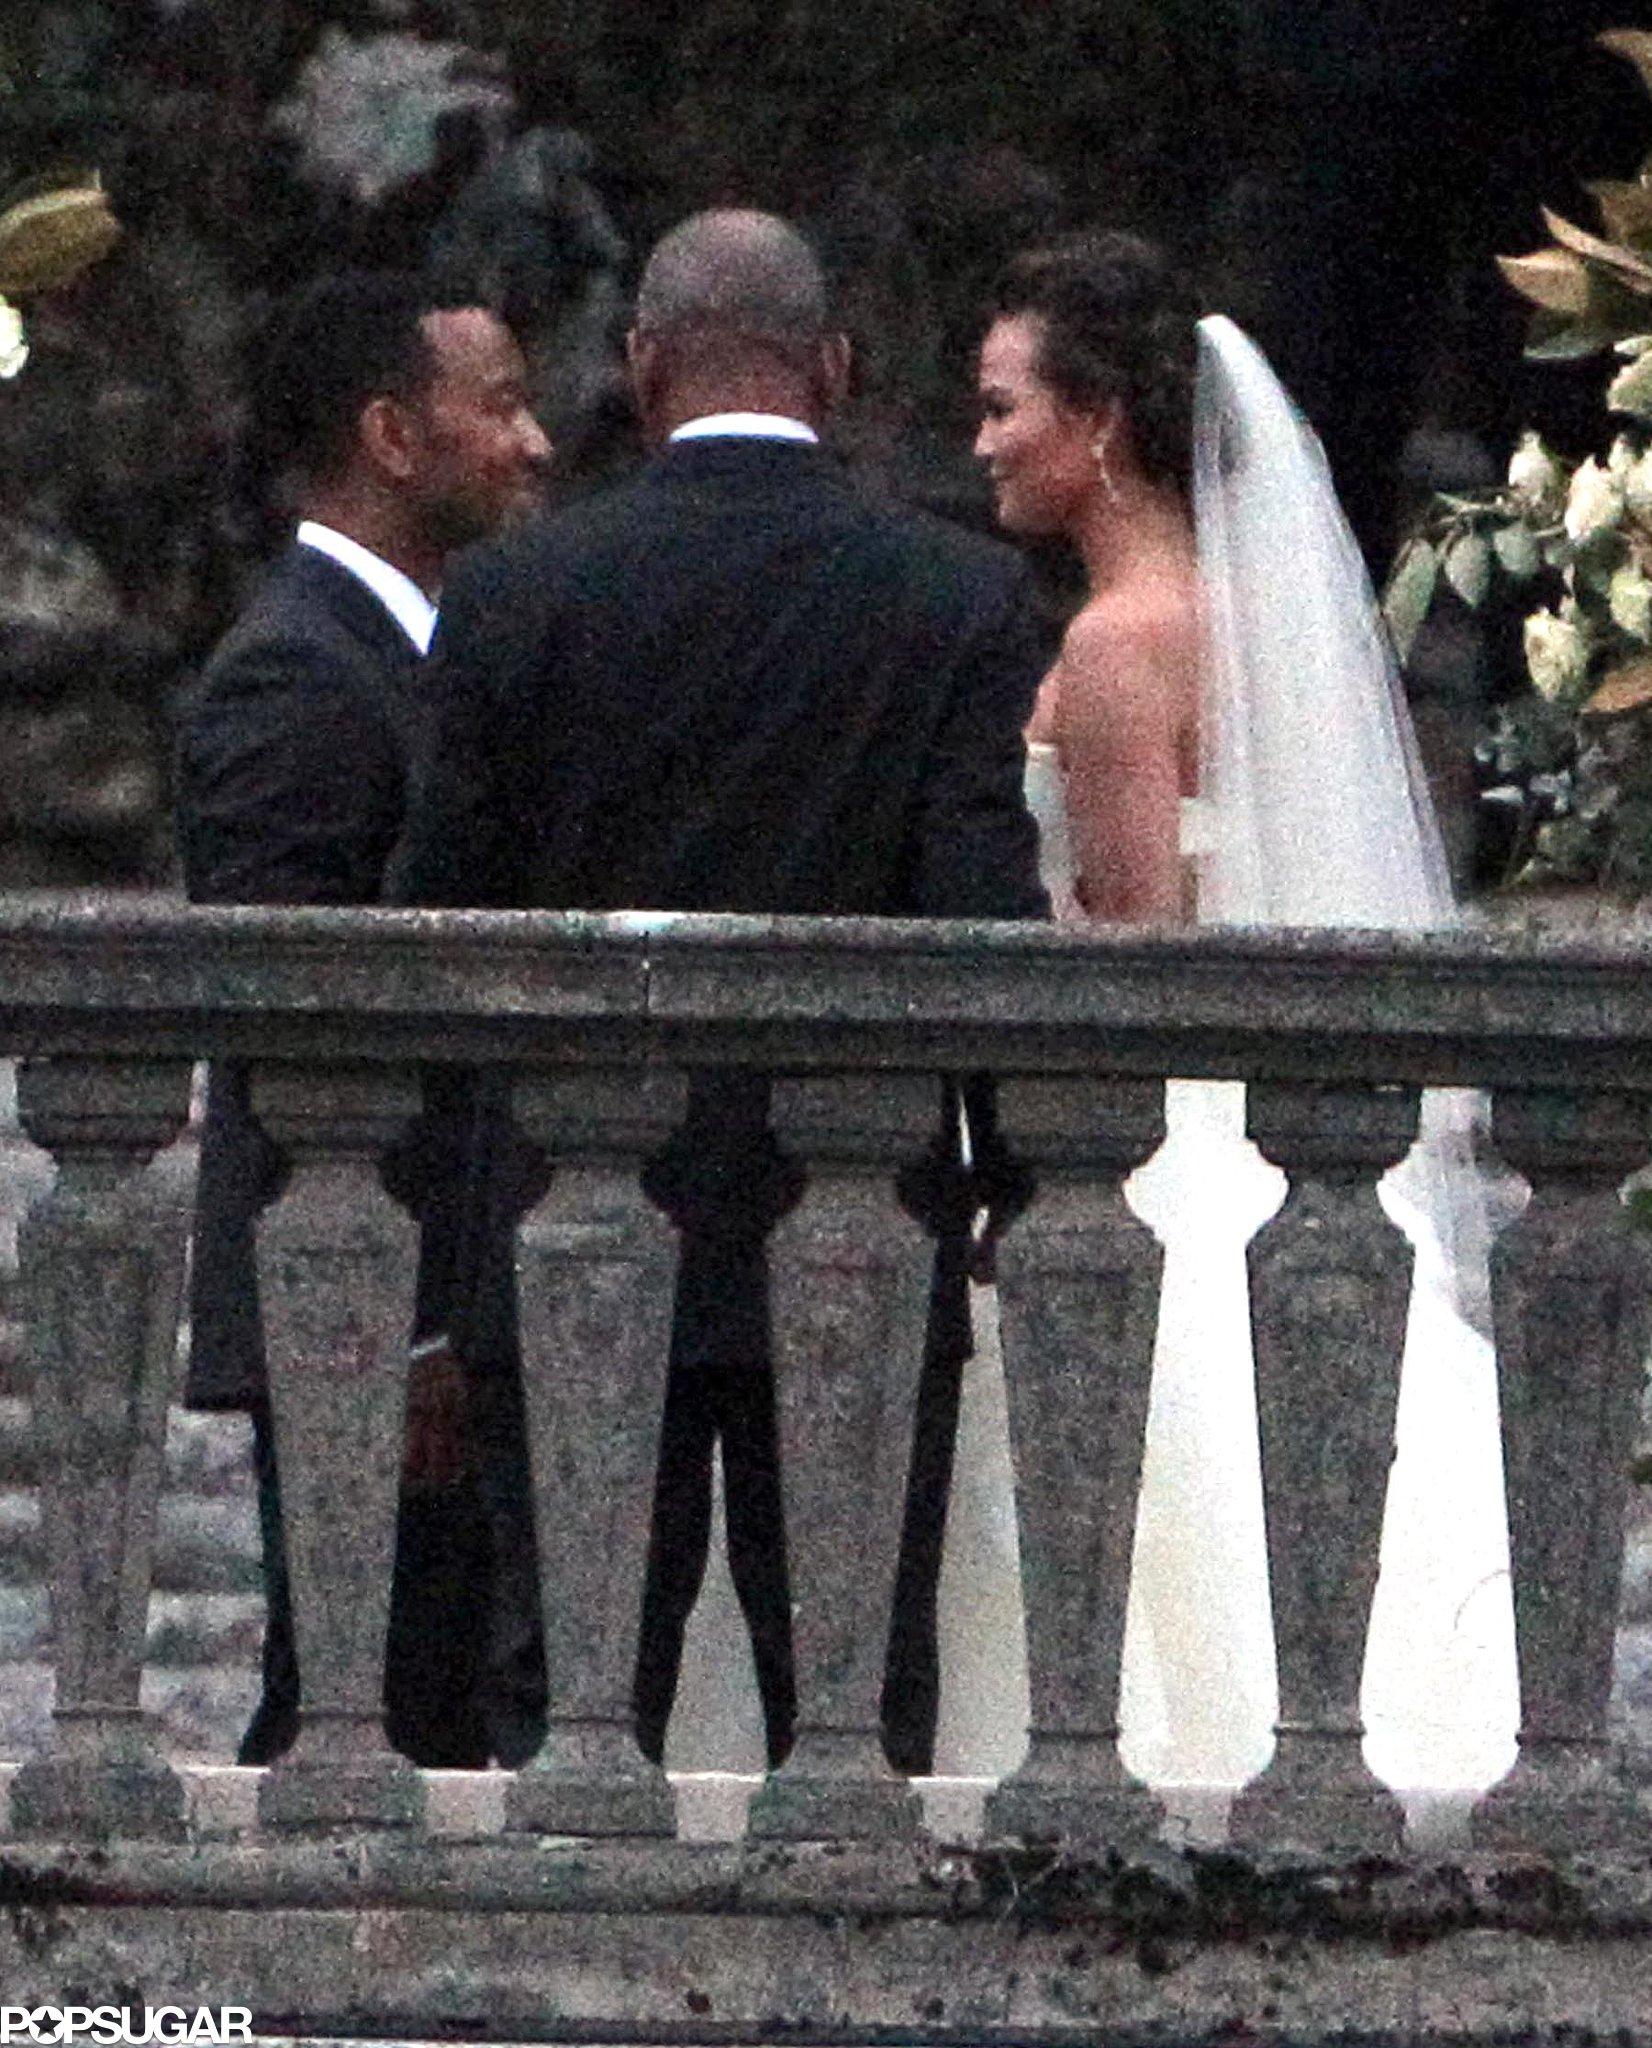 John Legend and Chrissy Teigen got married in September 2013 in Lake Como, Italy.